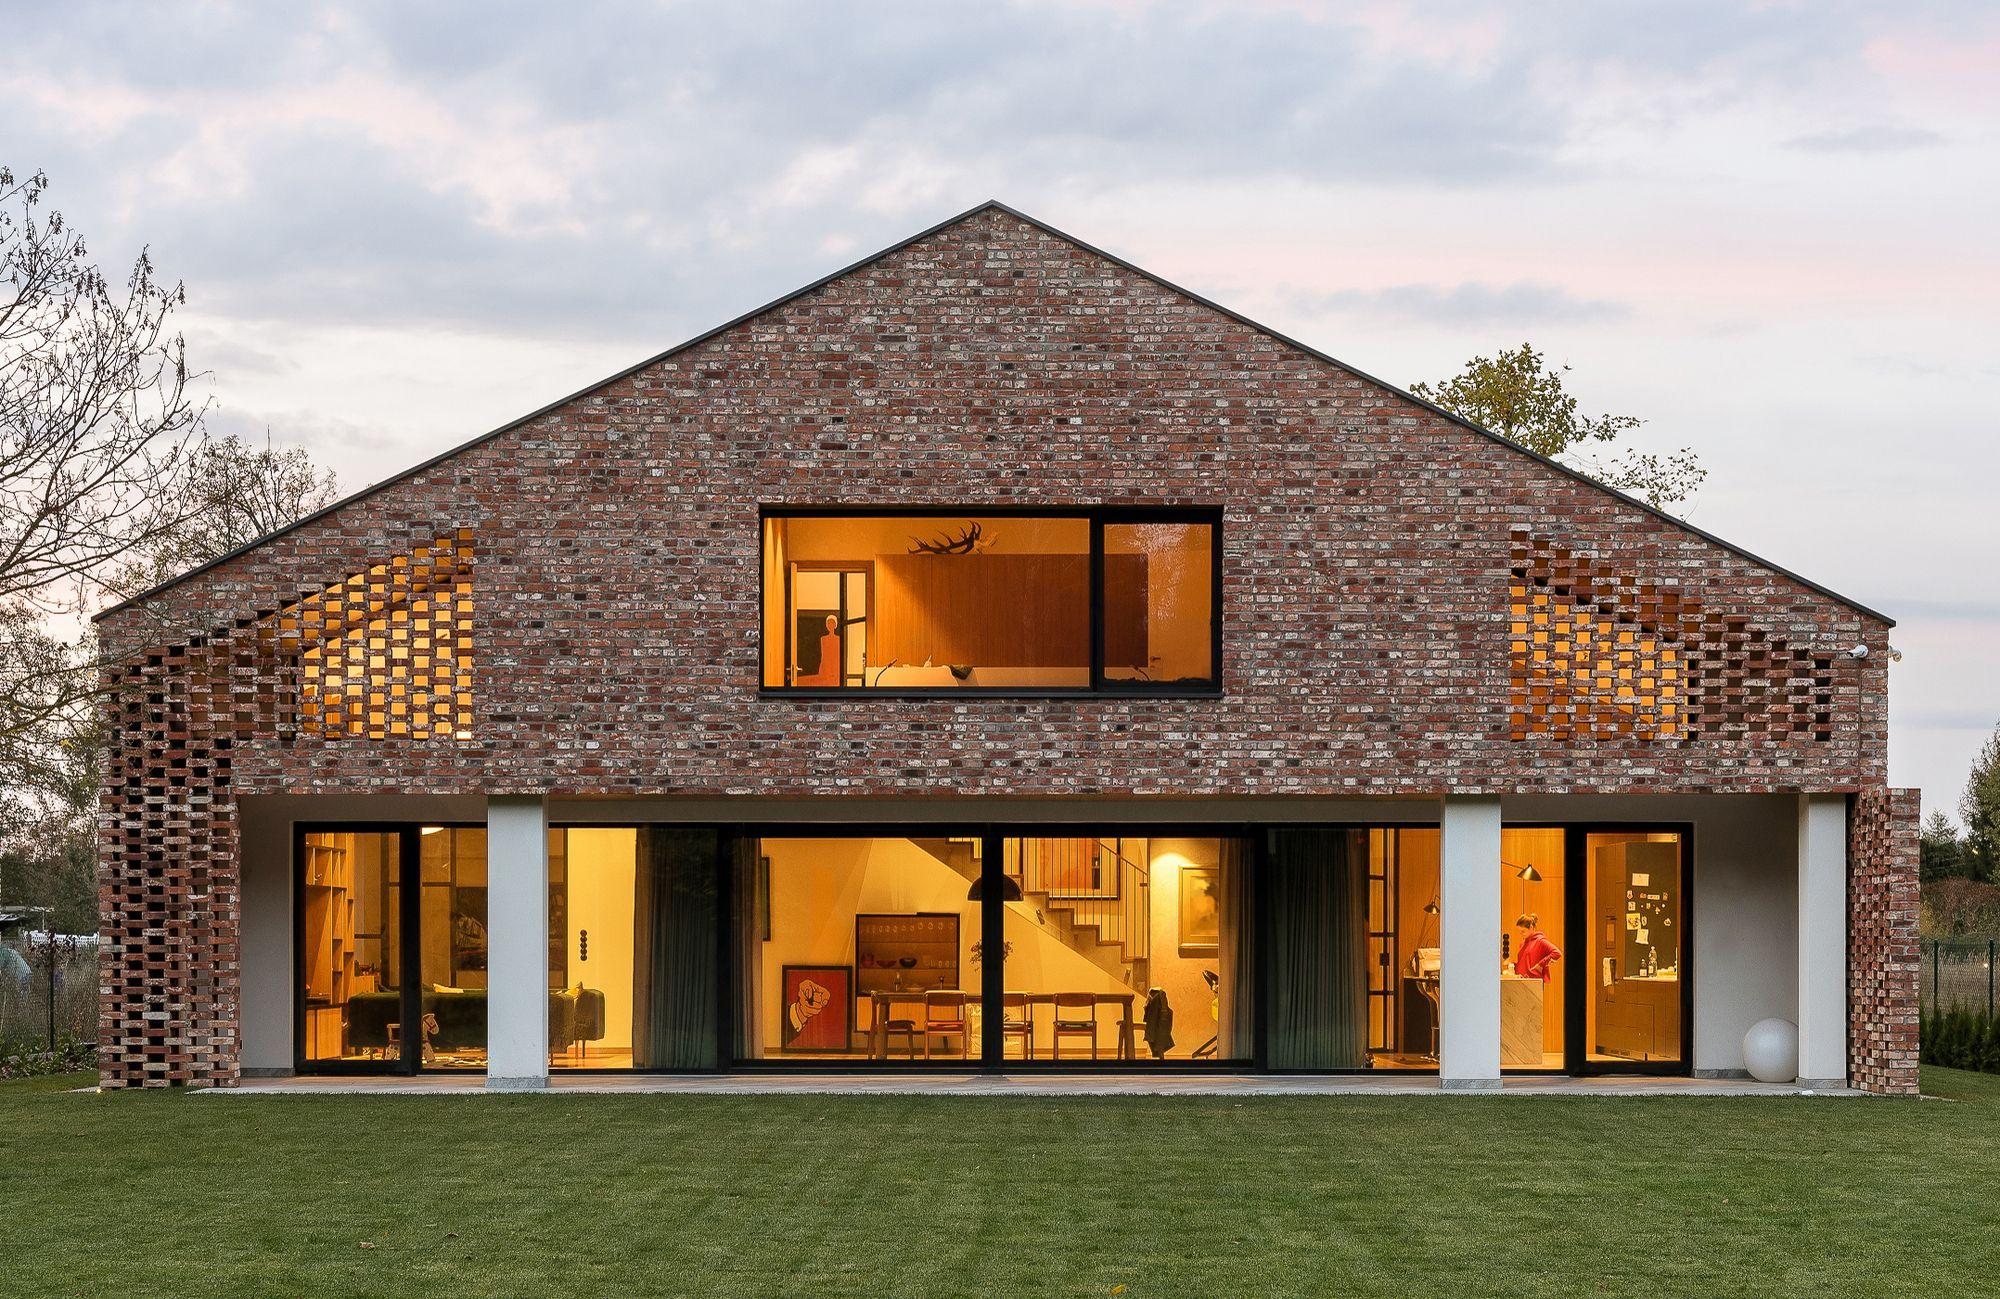 Old Brick New House Wrzeszcz Architekci Houses In Poland Architecture House Old Bricks